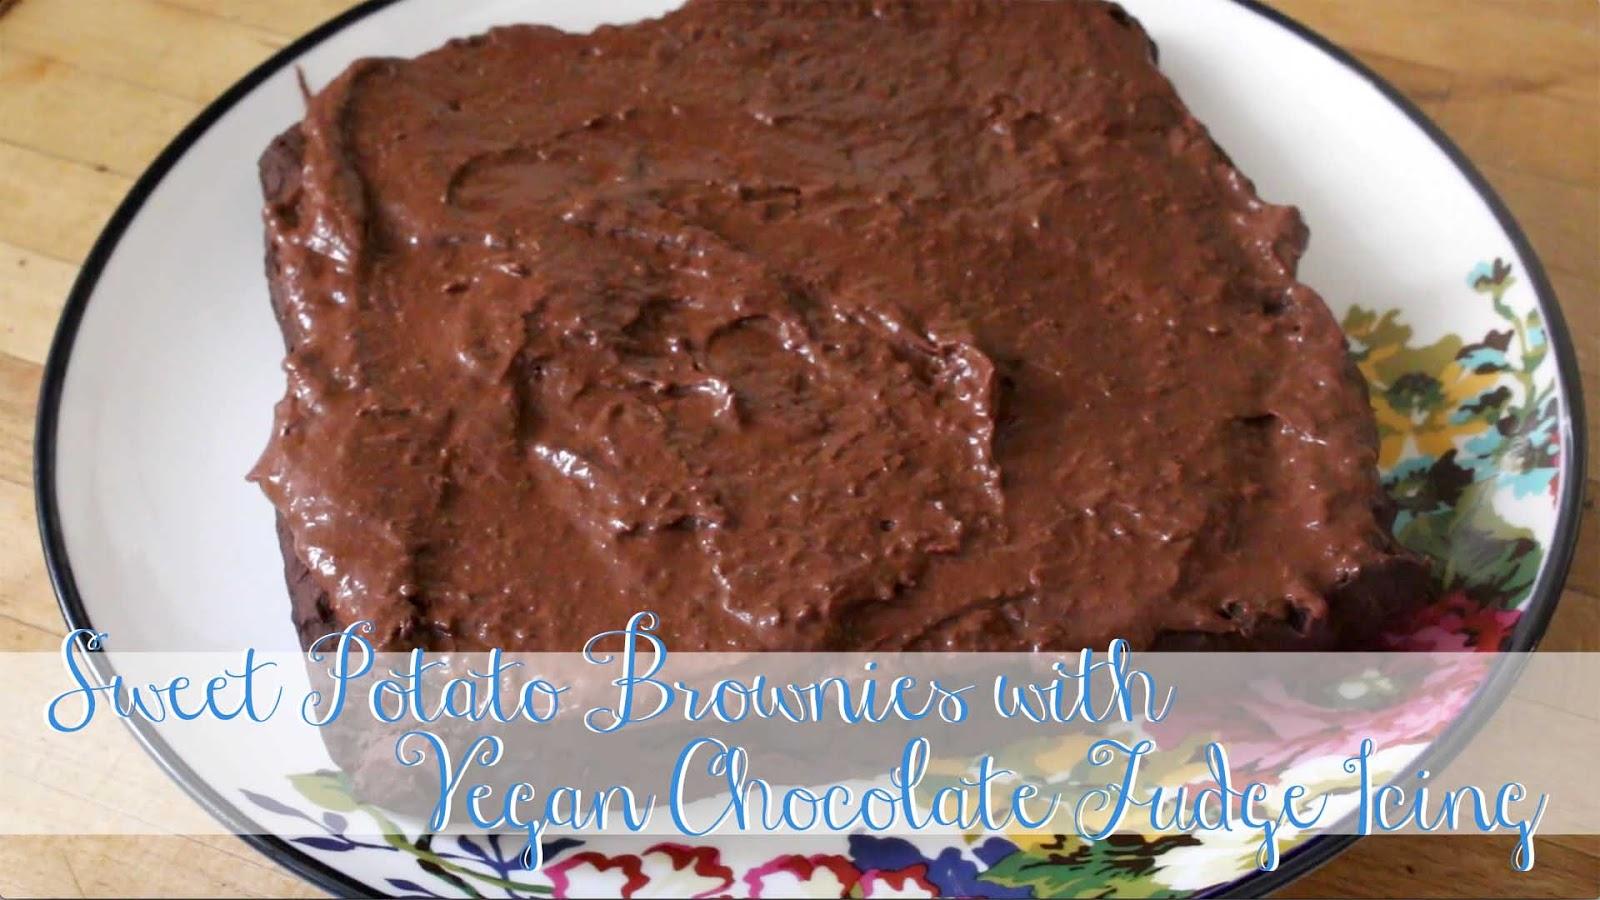 SWEET POTATO BROWNIES + VEGAN CHOCOLATE FUDGE ICING VIDEO